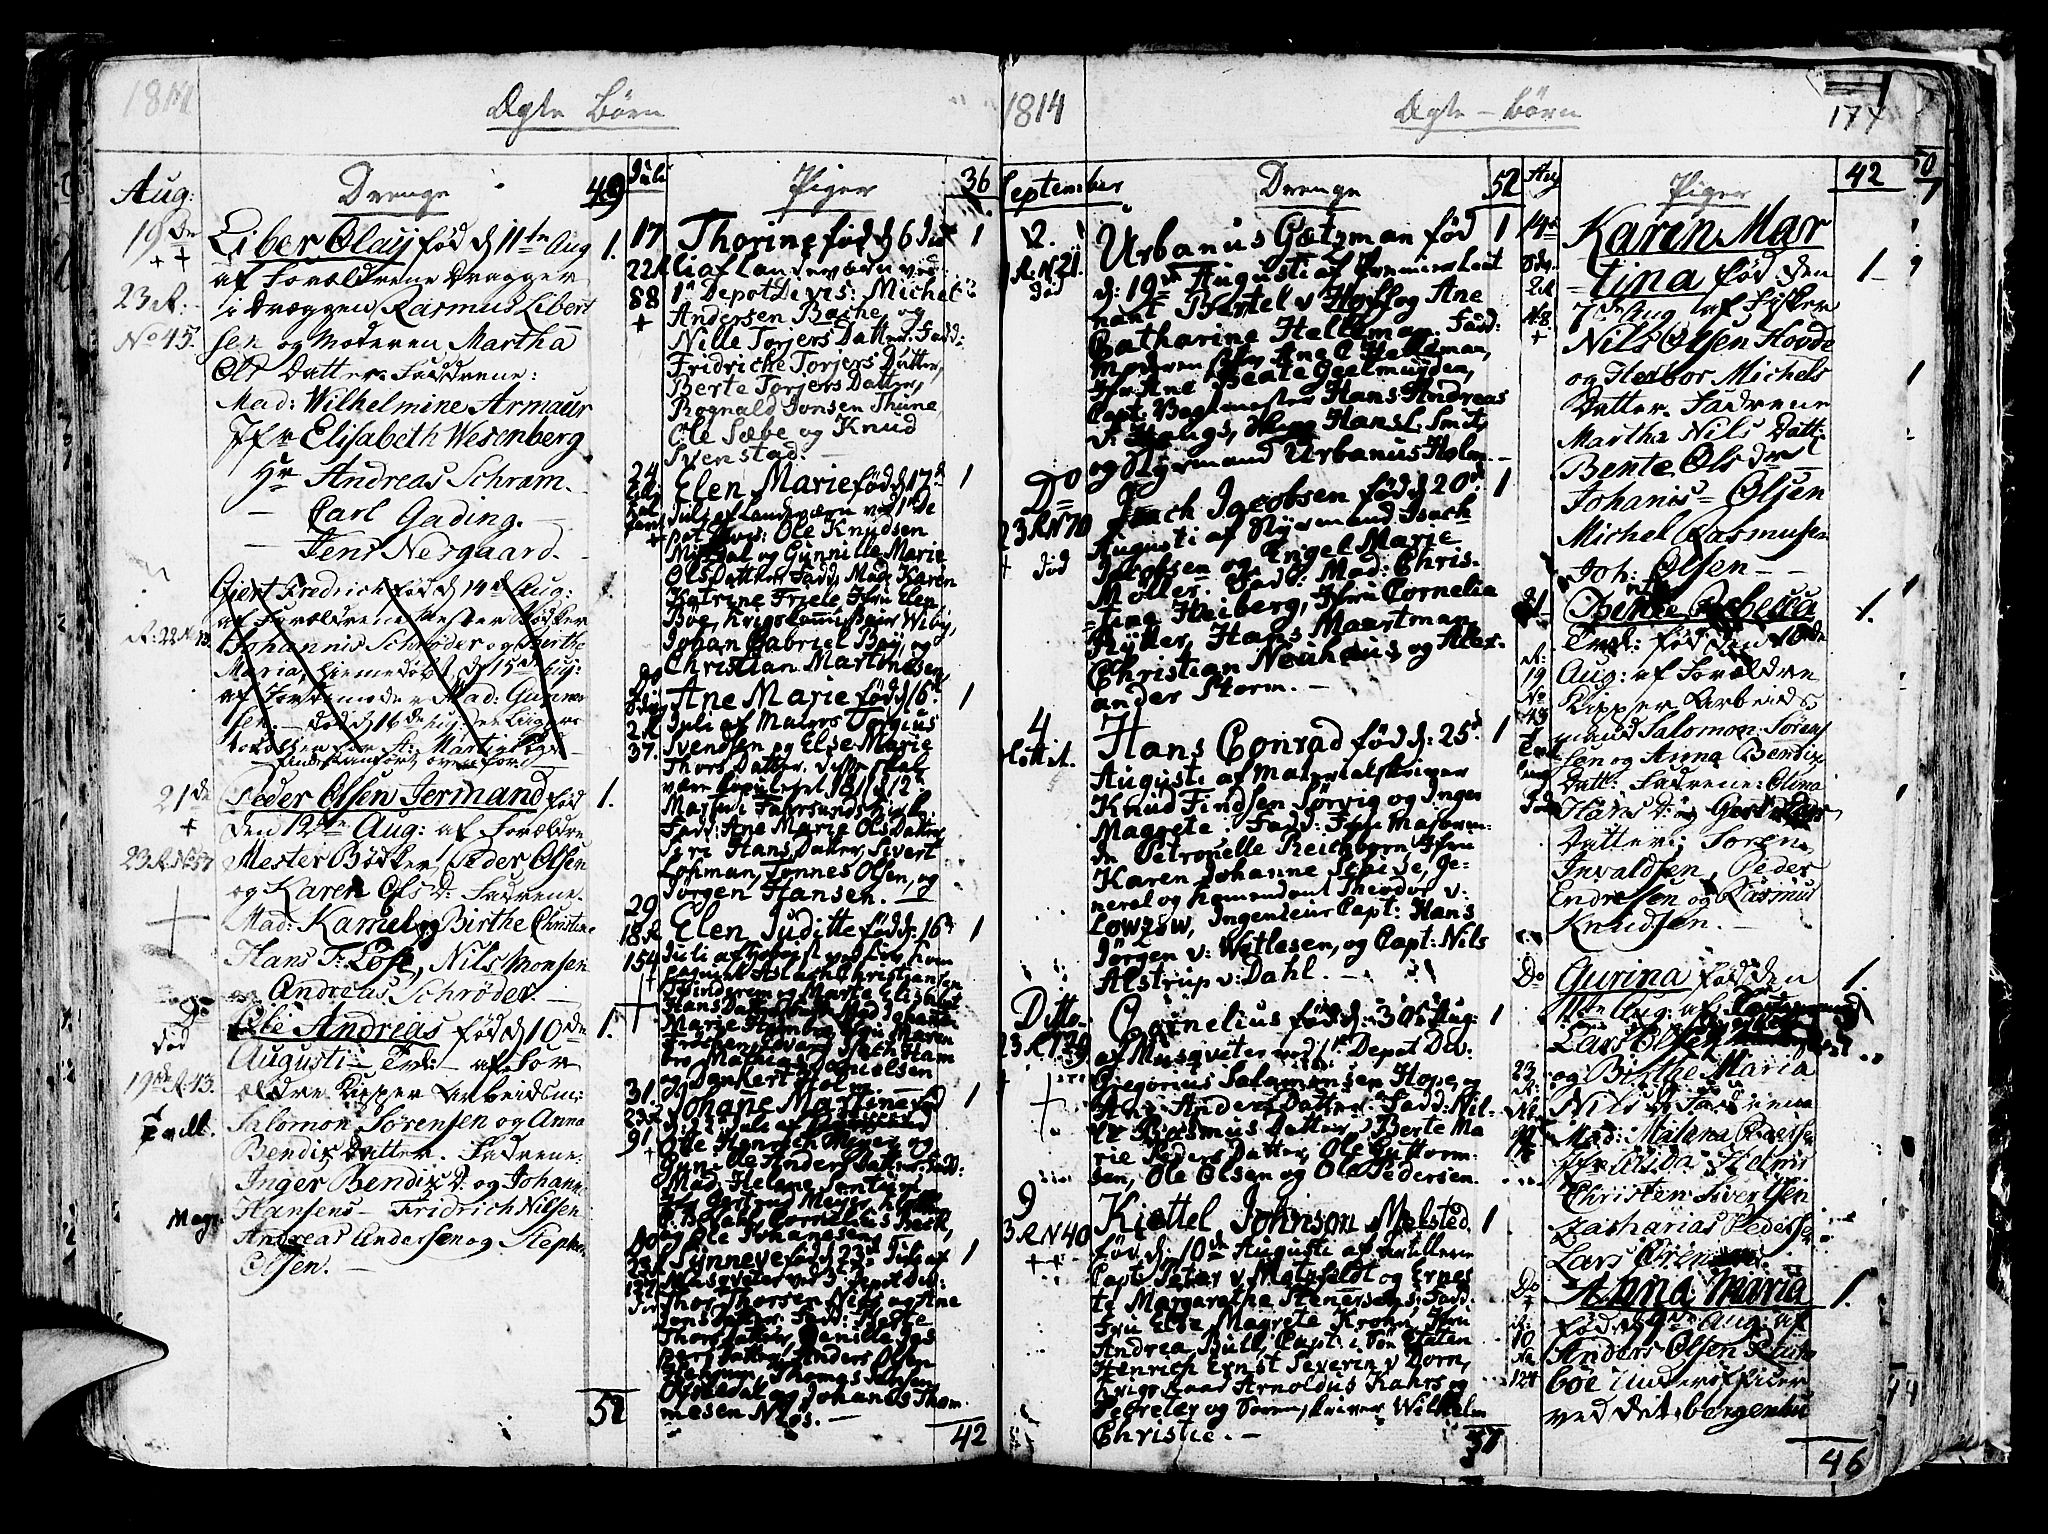 SAB, Korskirken Sokneprestembete, H/Haa/L0006: Ministerialbok nr. A 6, 1790-1820, s. 174